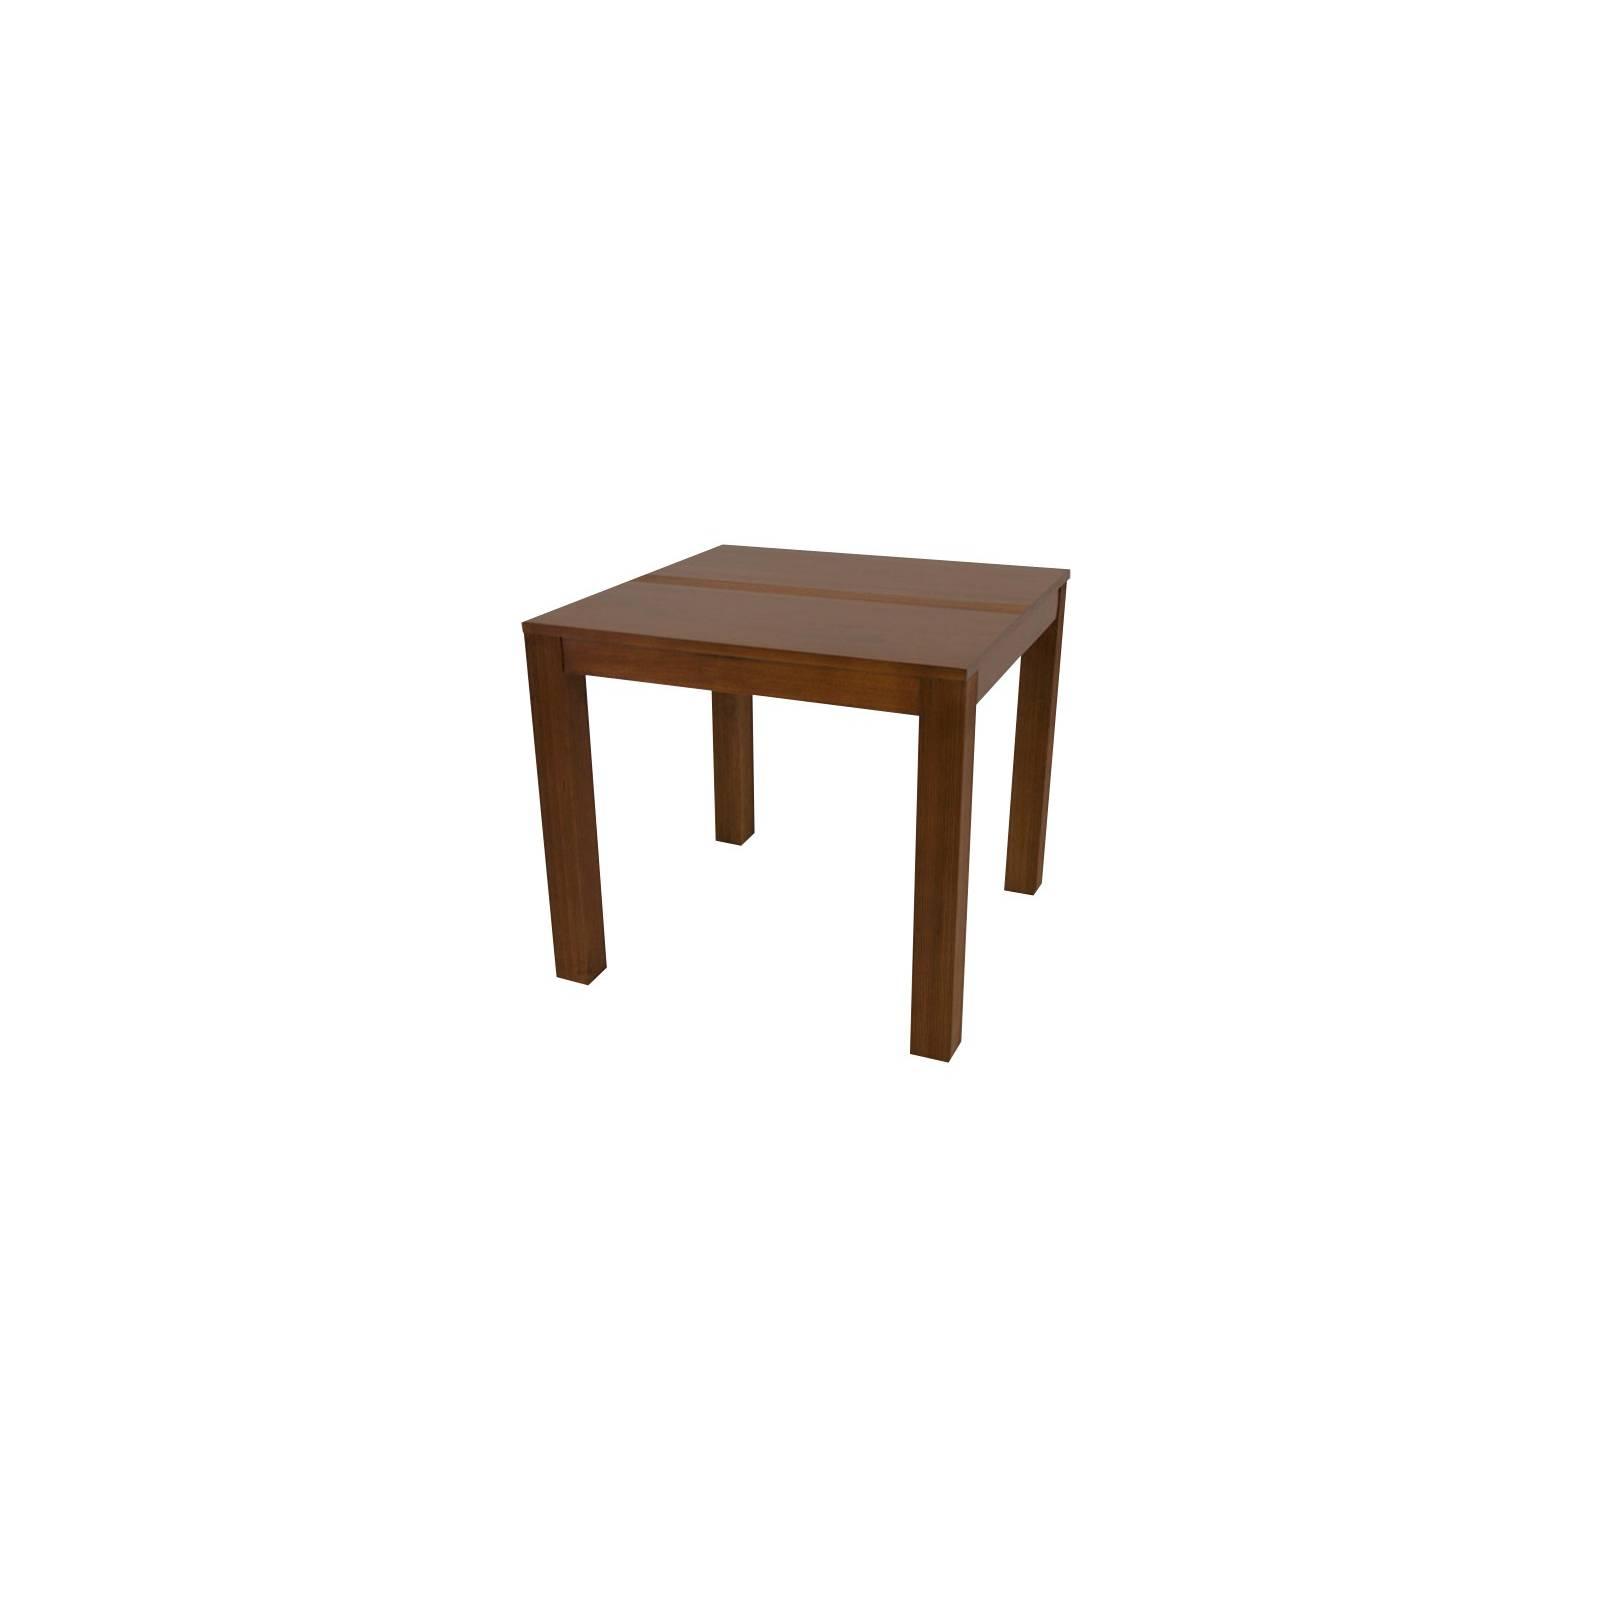 Table de Séjour Siguiri Hévéa - meuble bois massif